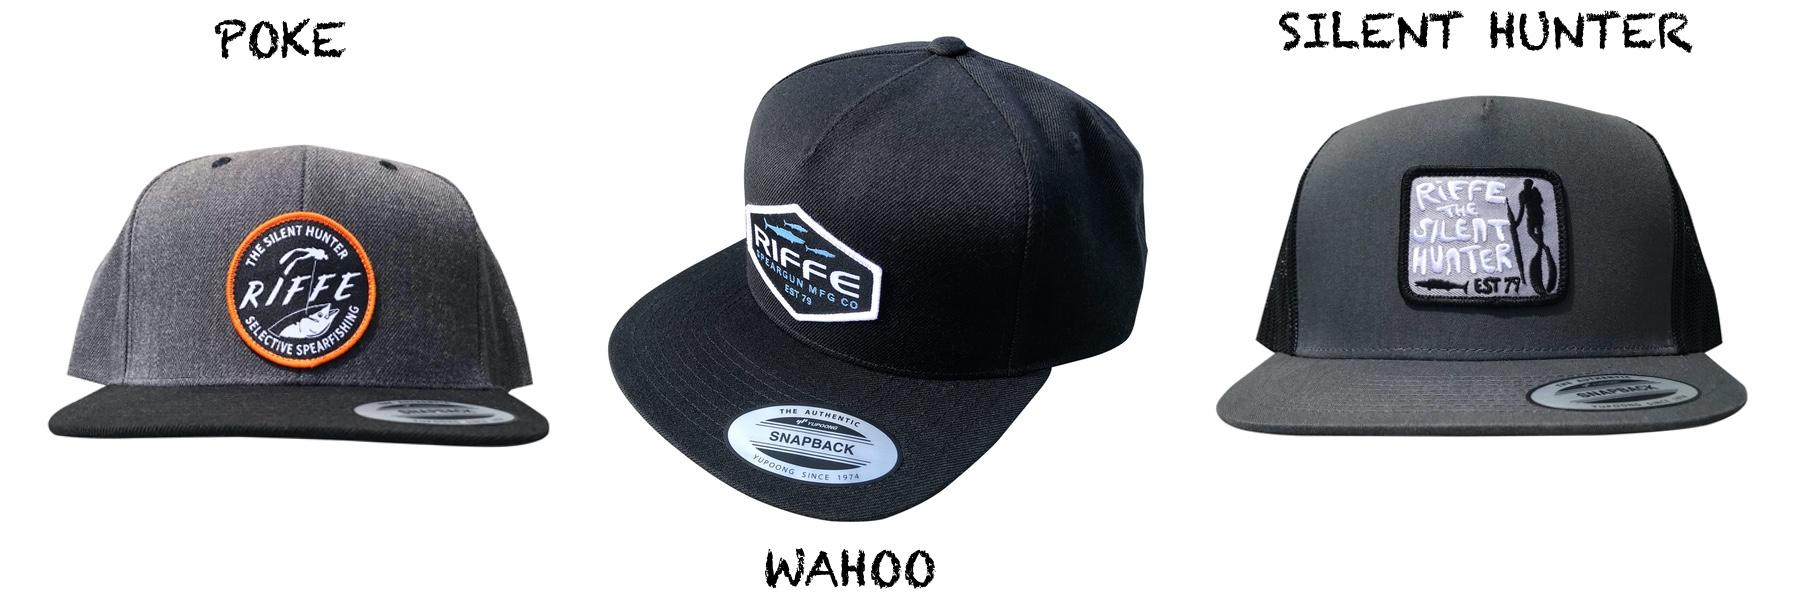 Riffe Hats